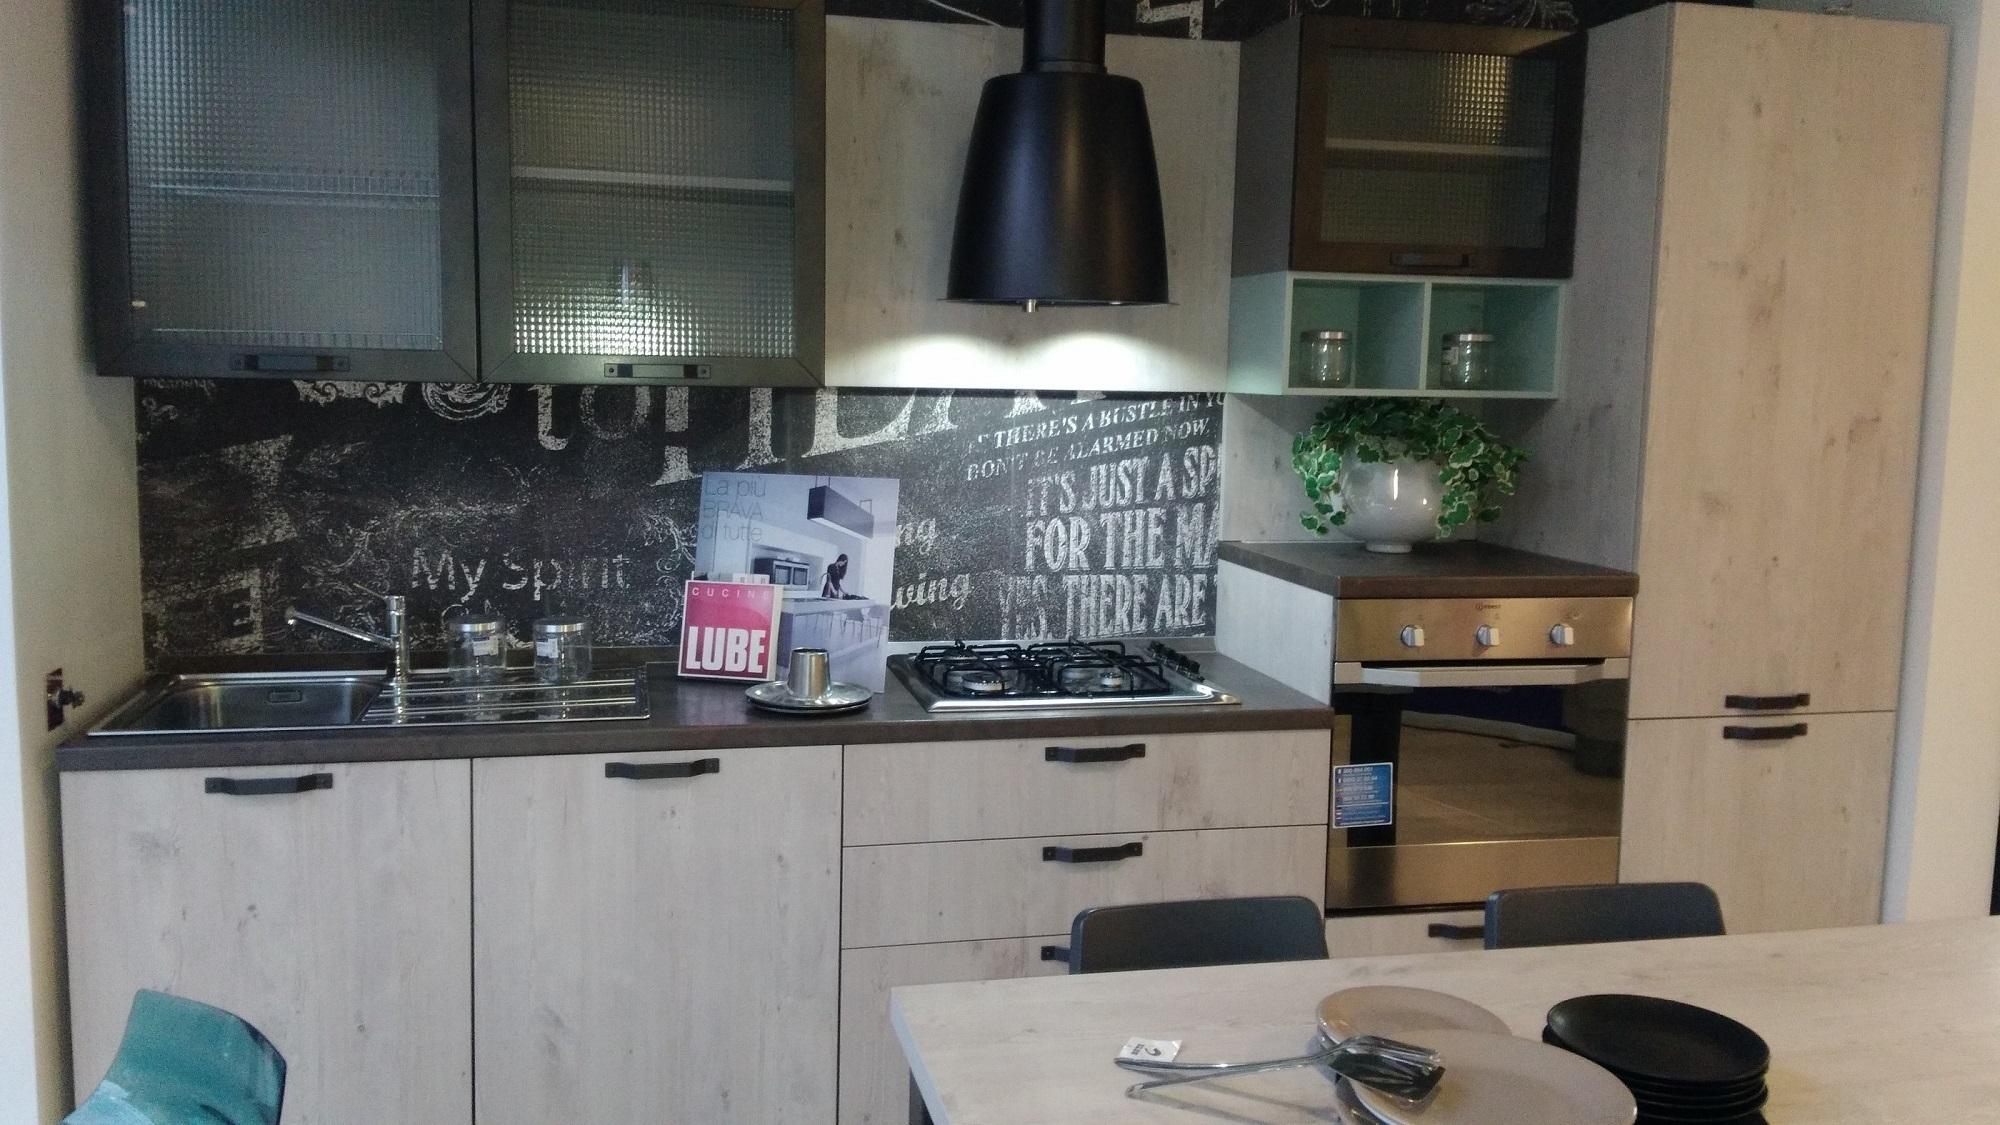 Cucina kyra vintage creo kitchens scontata cucine a - Cucina lube kyra ...